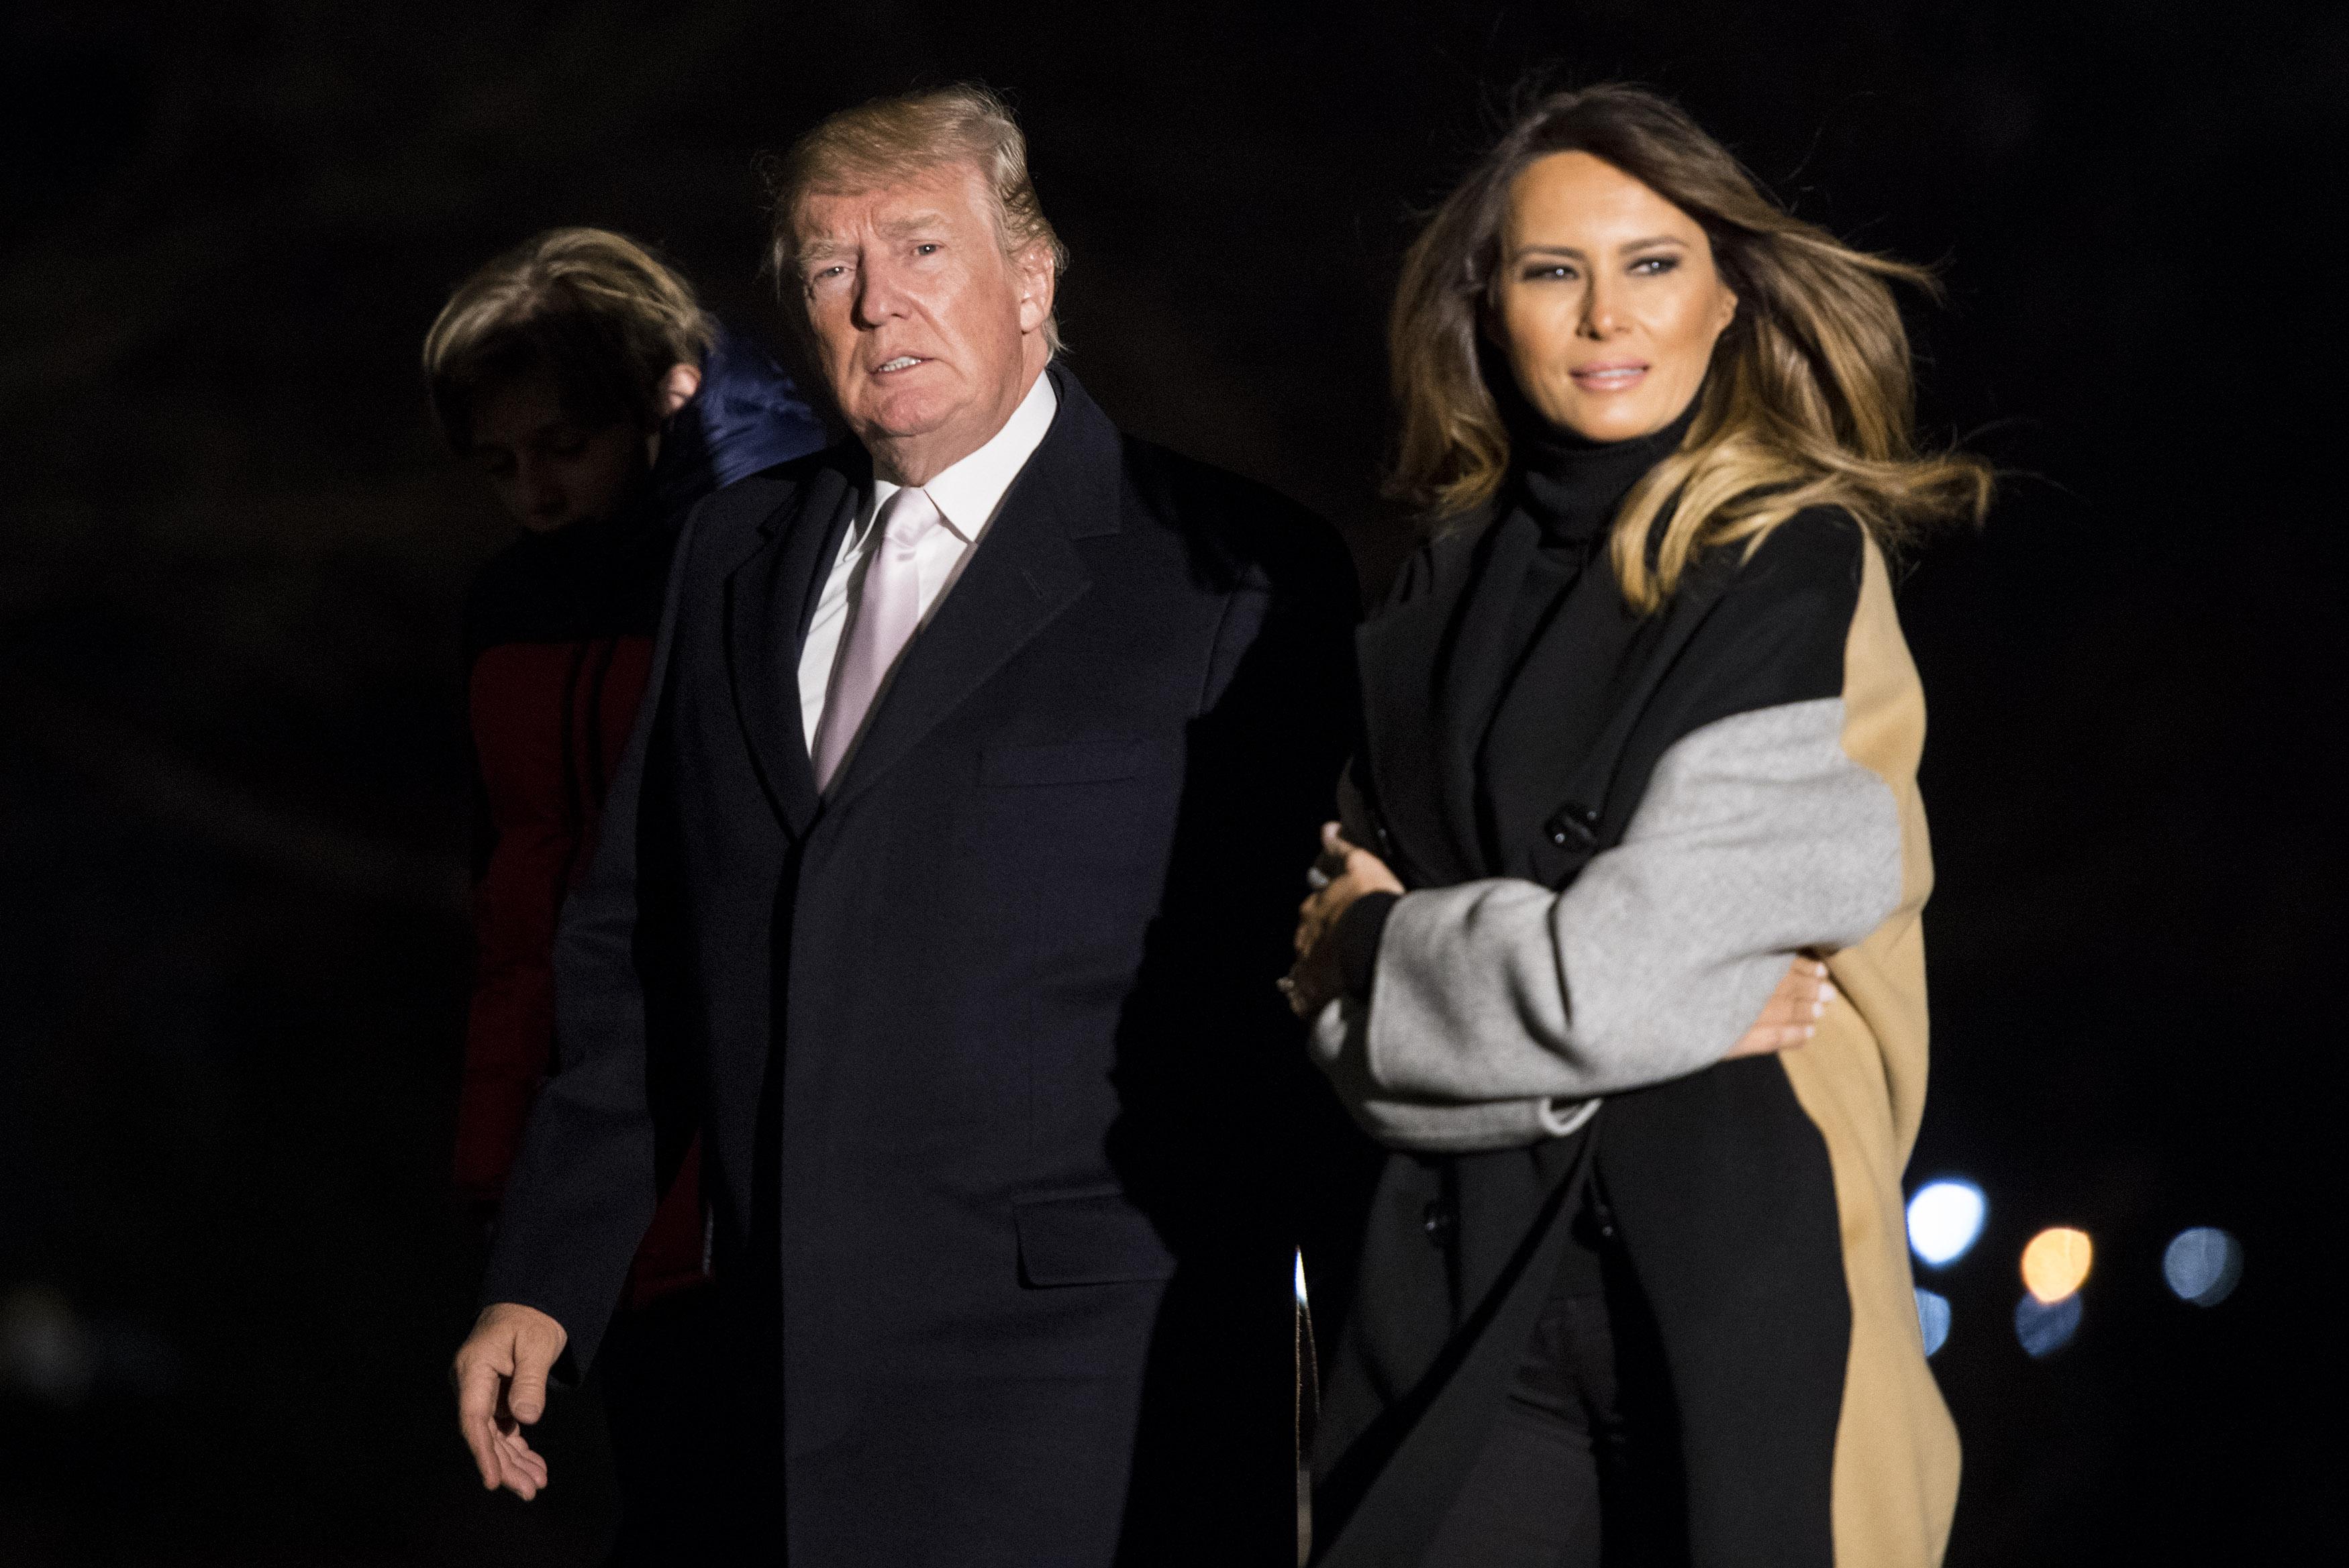 Melania Trump Spends Valentine S Day Visiting Sick Kids Cnn Politics